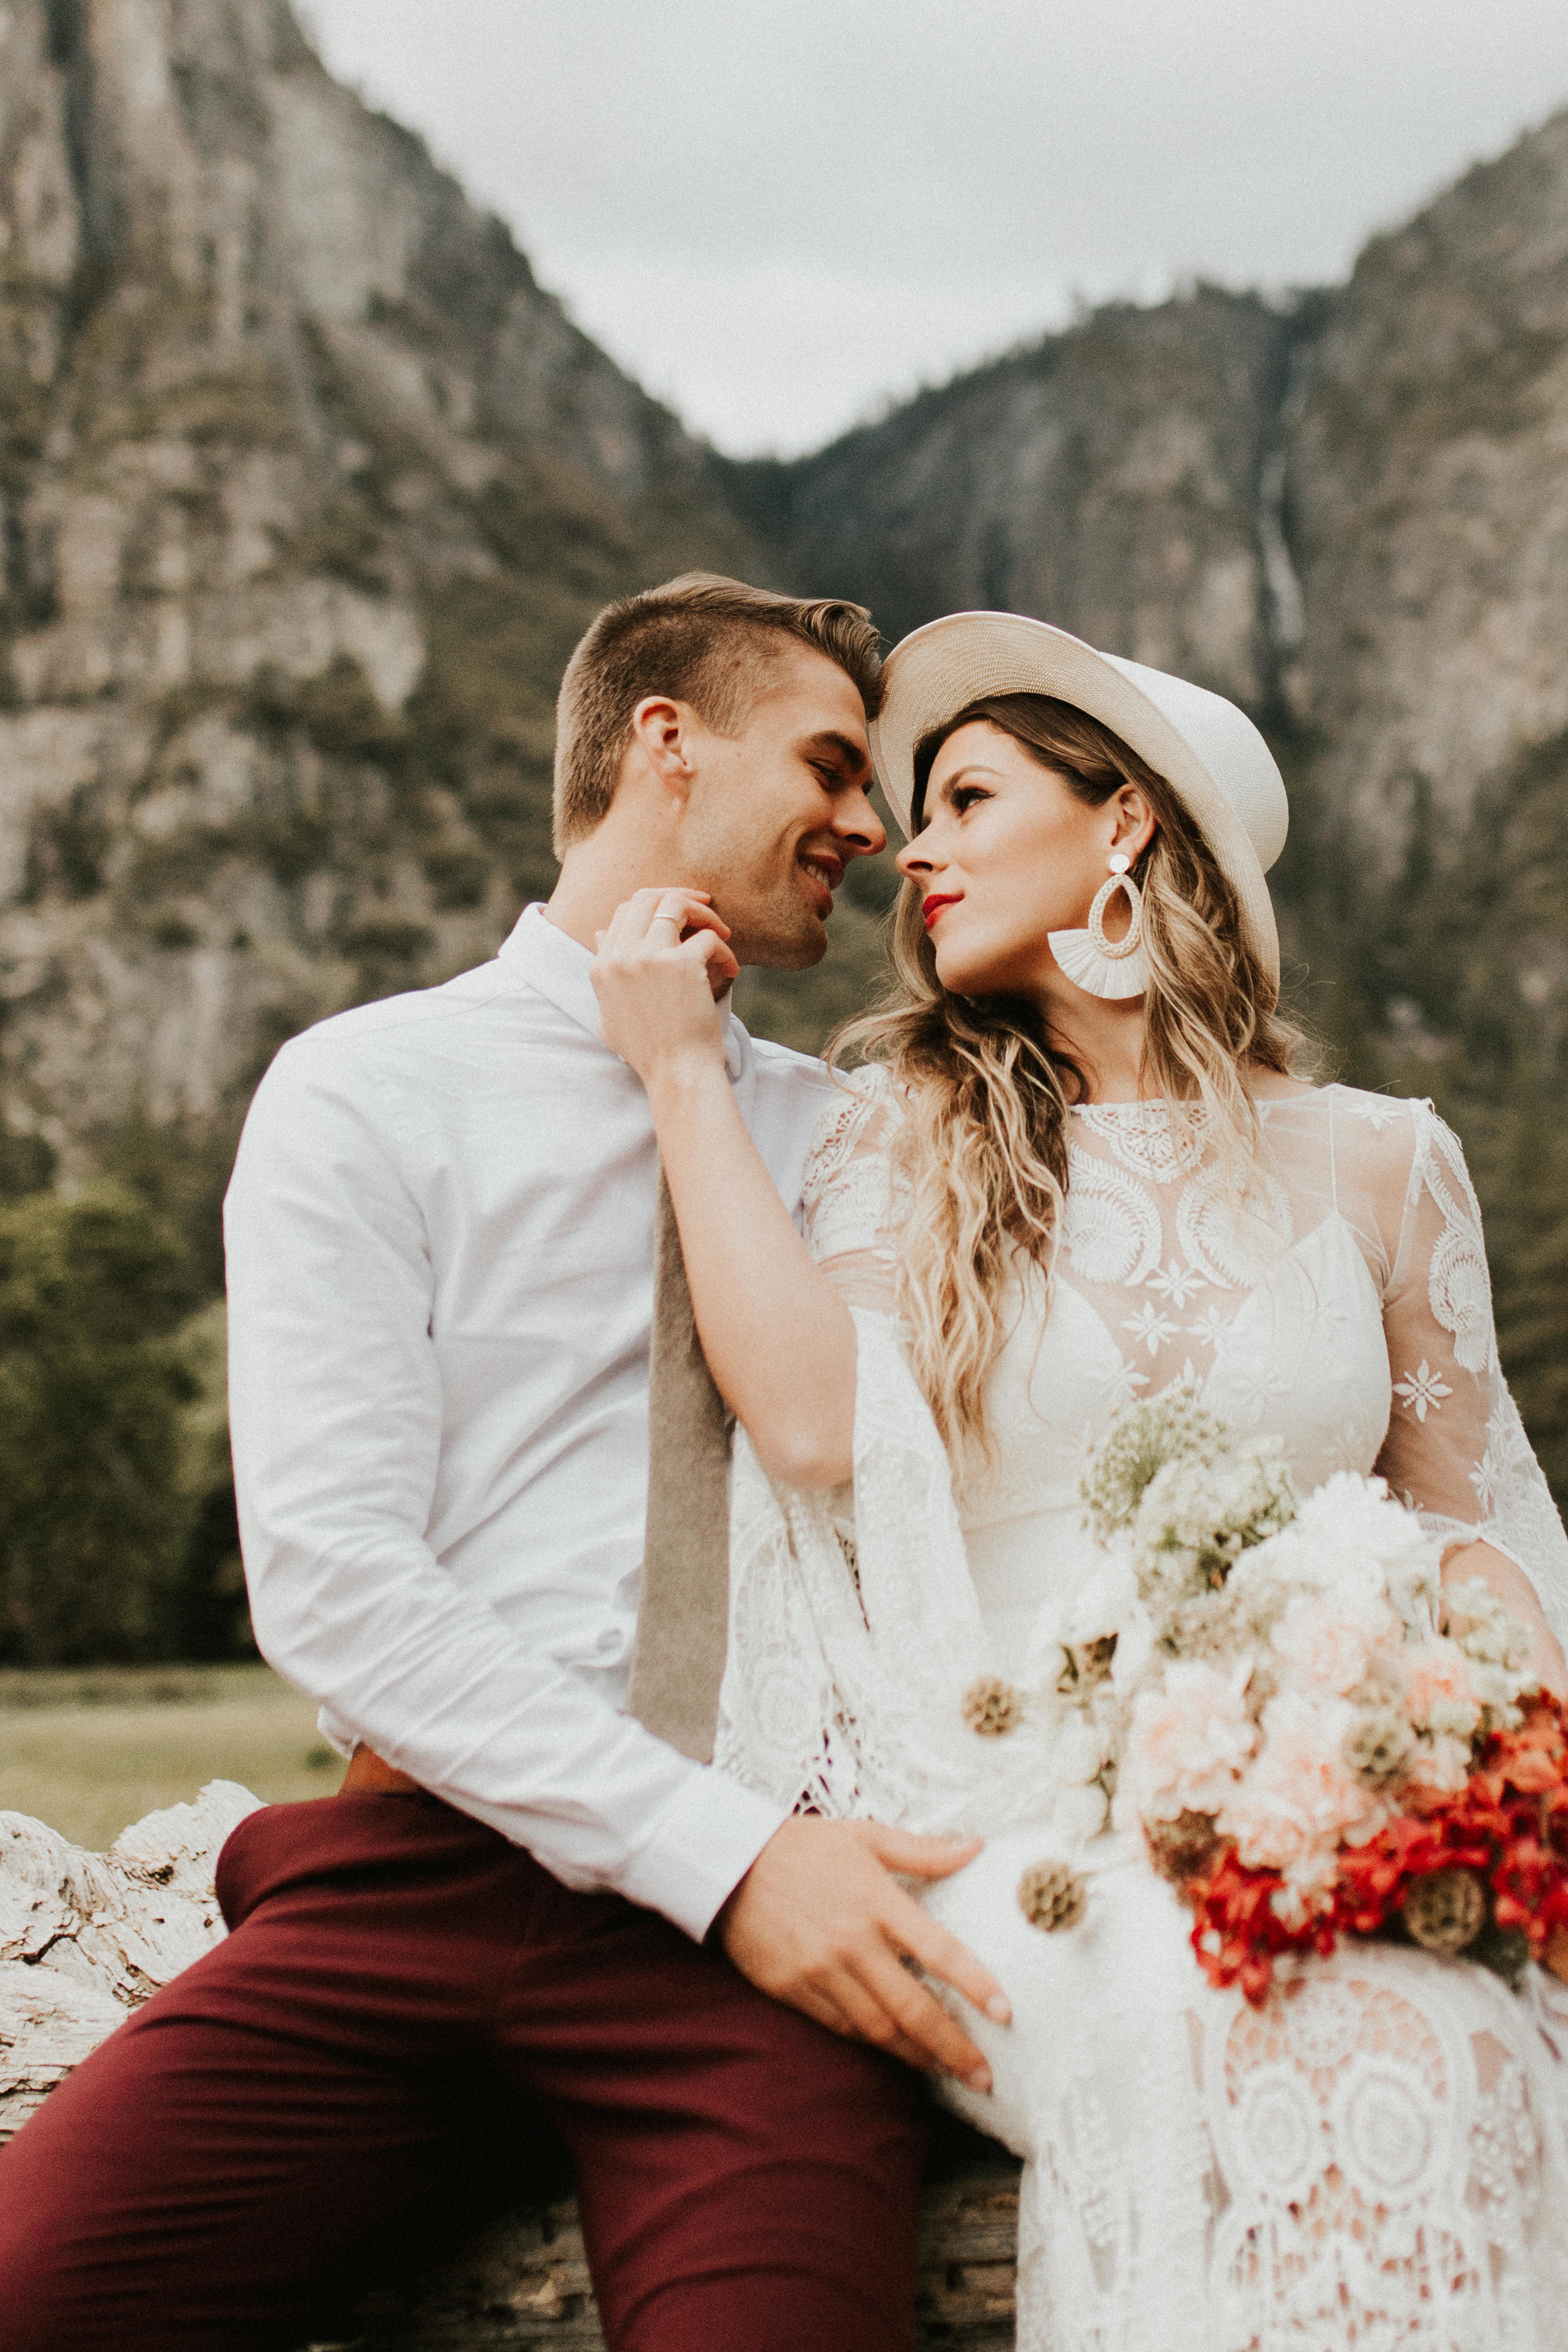 Yosemite_Elopement_Hannah_Alena_Photo_Portland_Wedding_Photographer-559.jpg